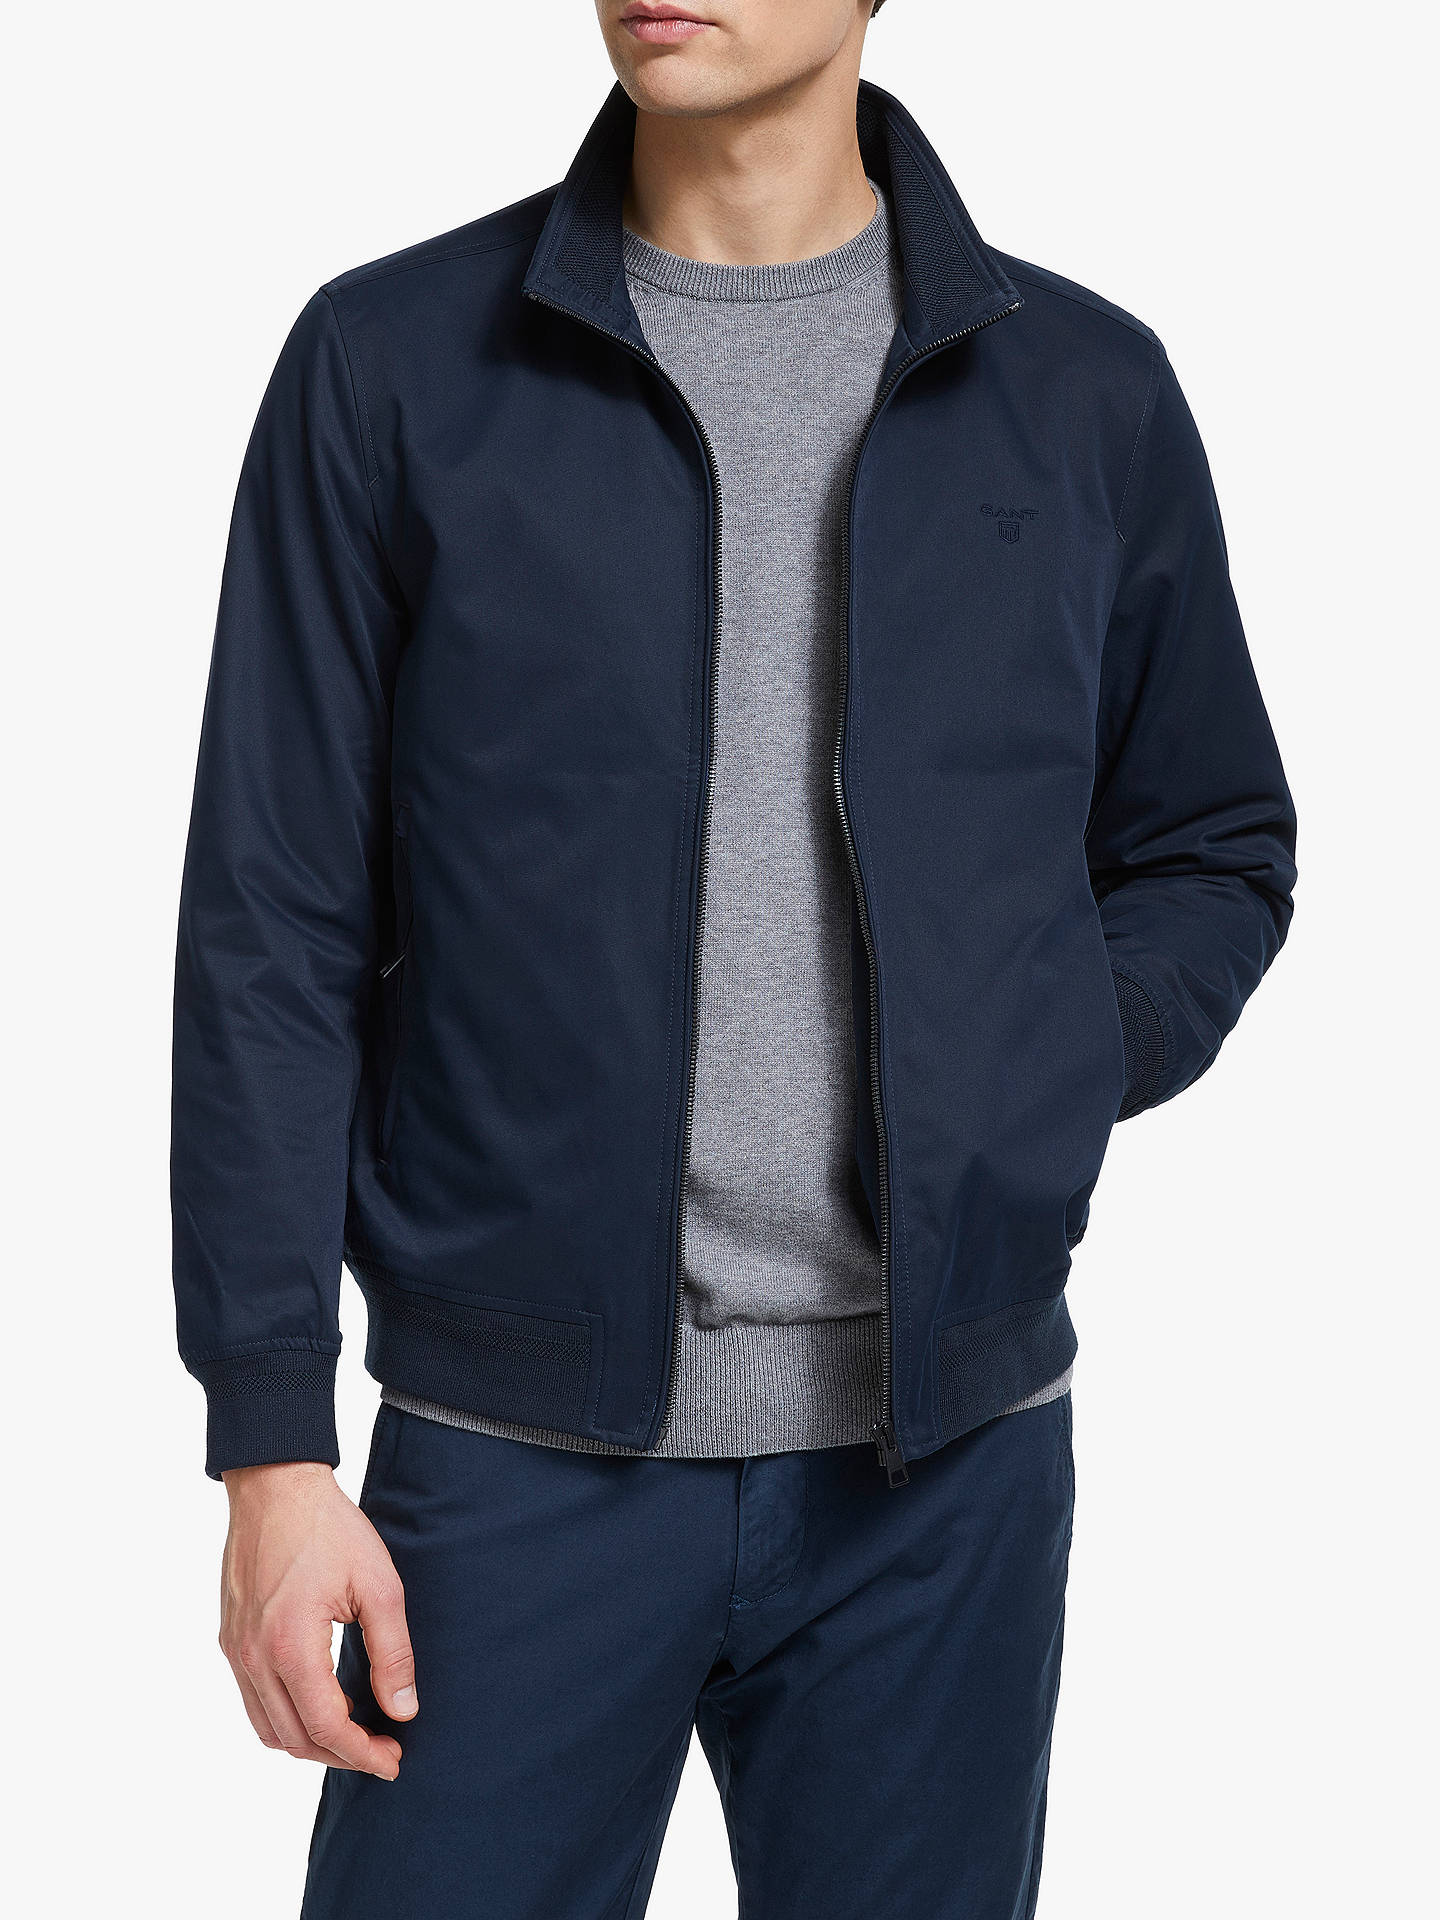 10e84db2445 Buy GANT The Comfort Hampshire Jacket, Evening Blue, L Online at  johnlewis.com ...